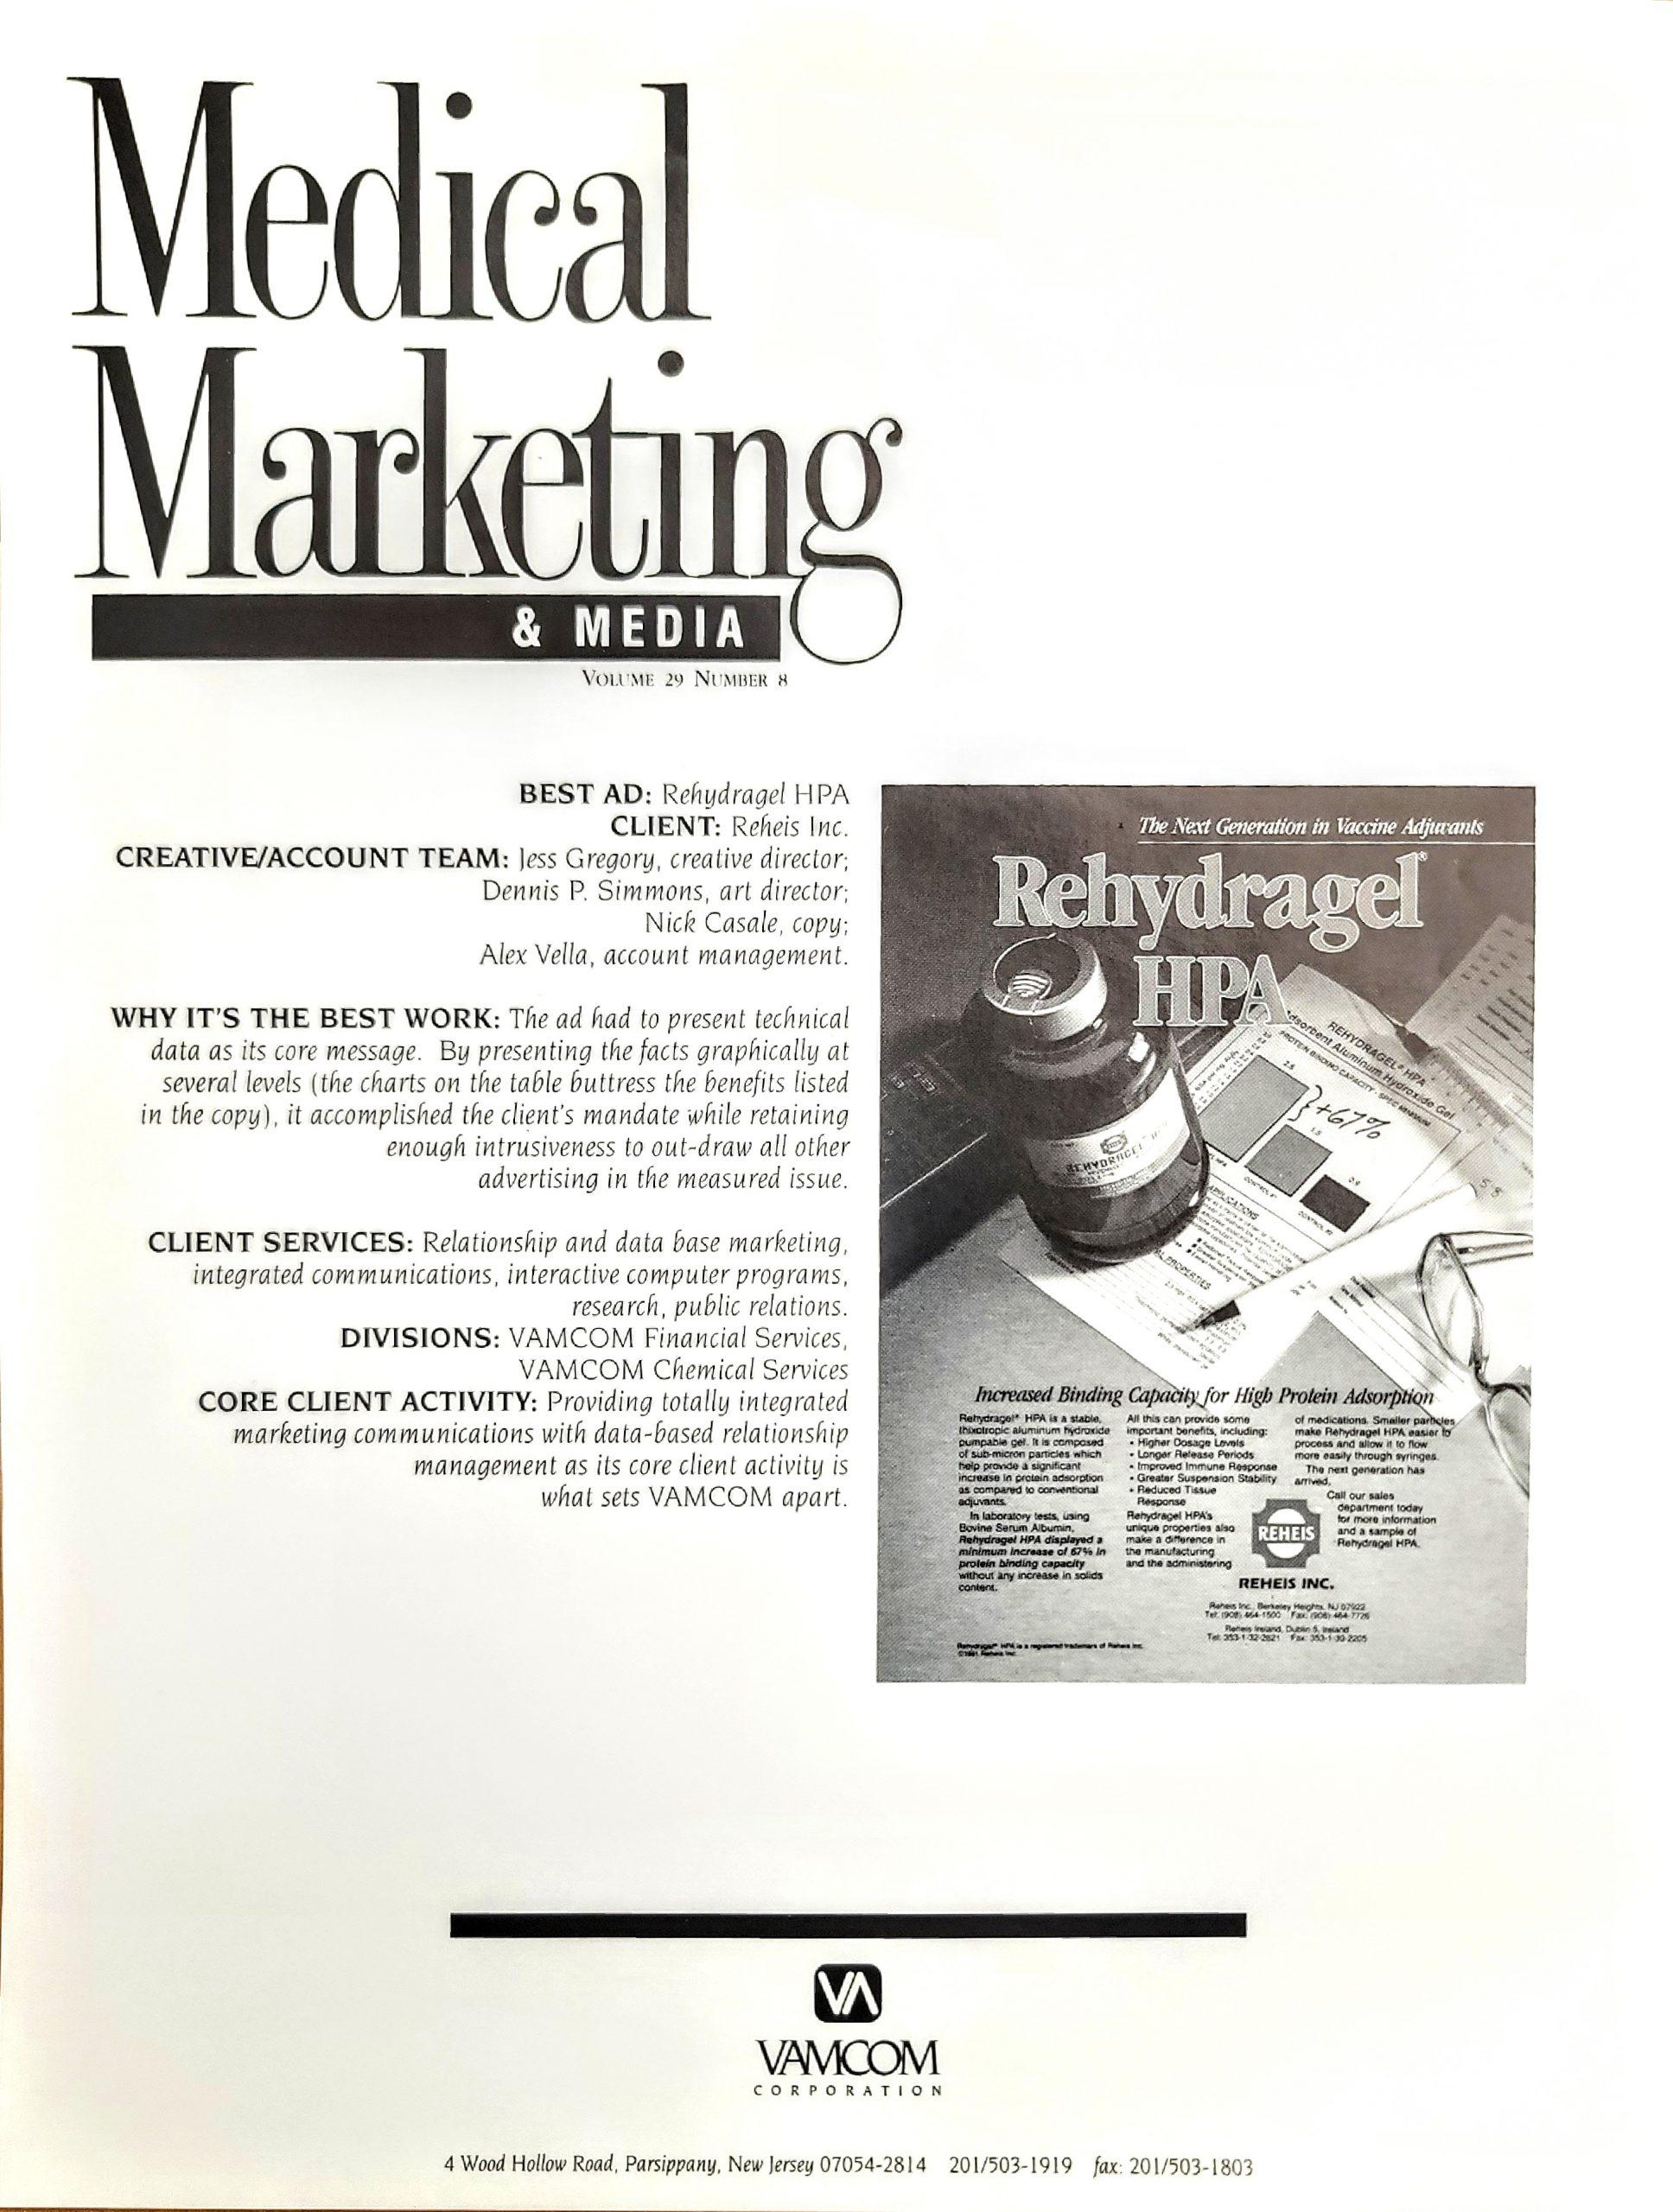 reheis_medical marketing_article_1